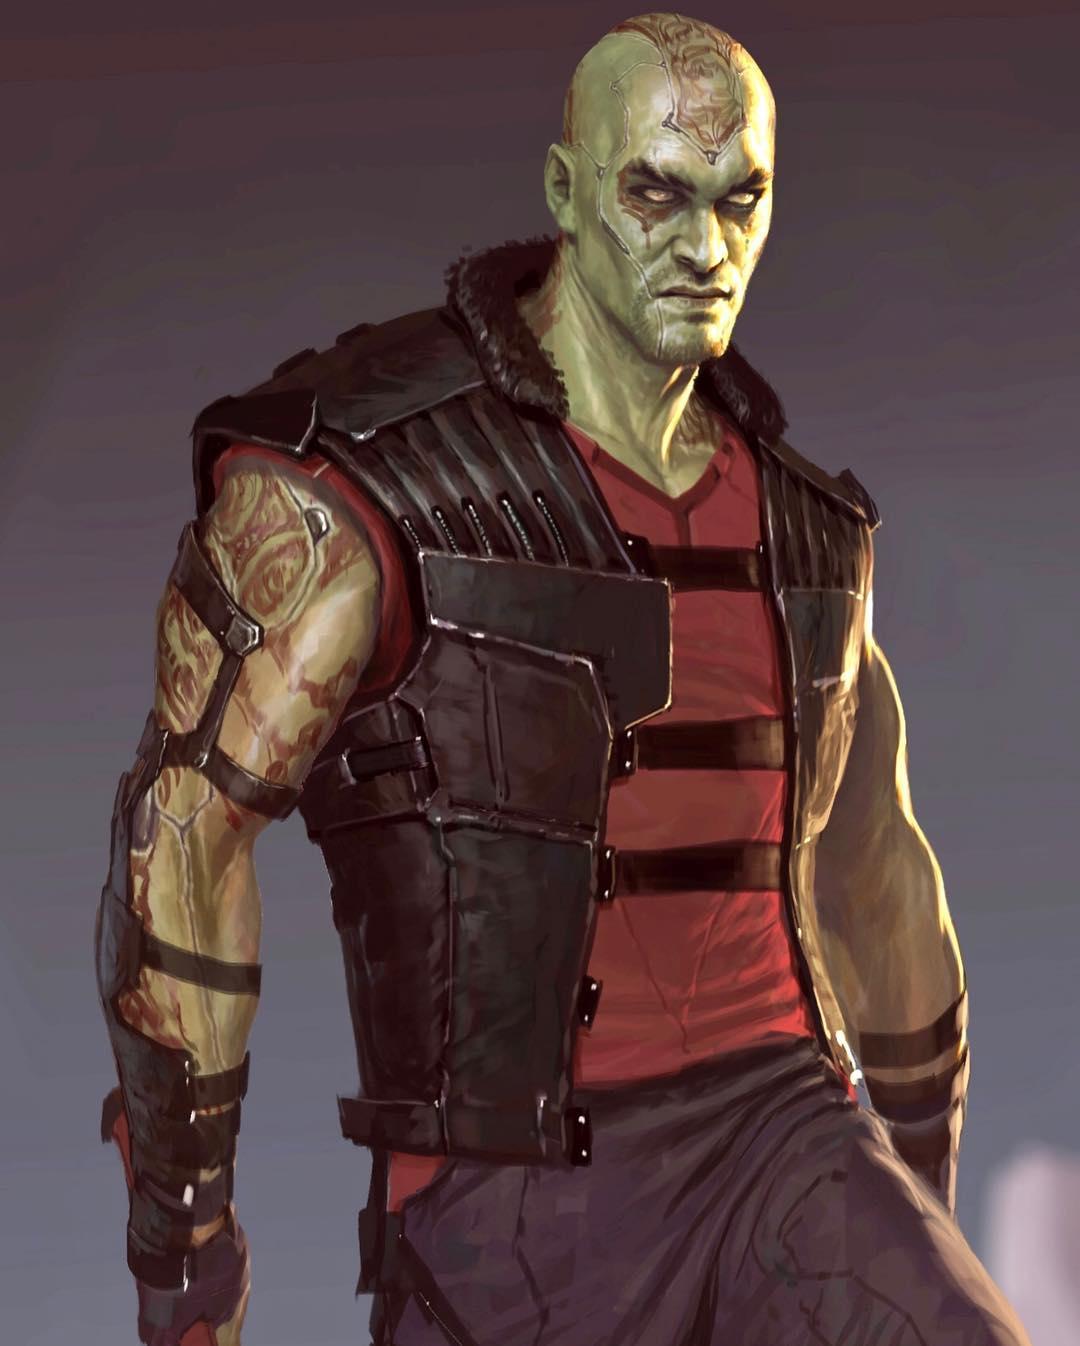 Jason Momoa Drax Guardians of the Galaxy Concept Art